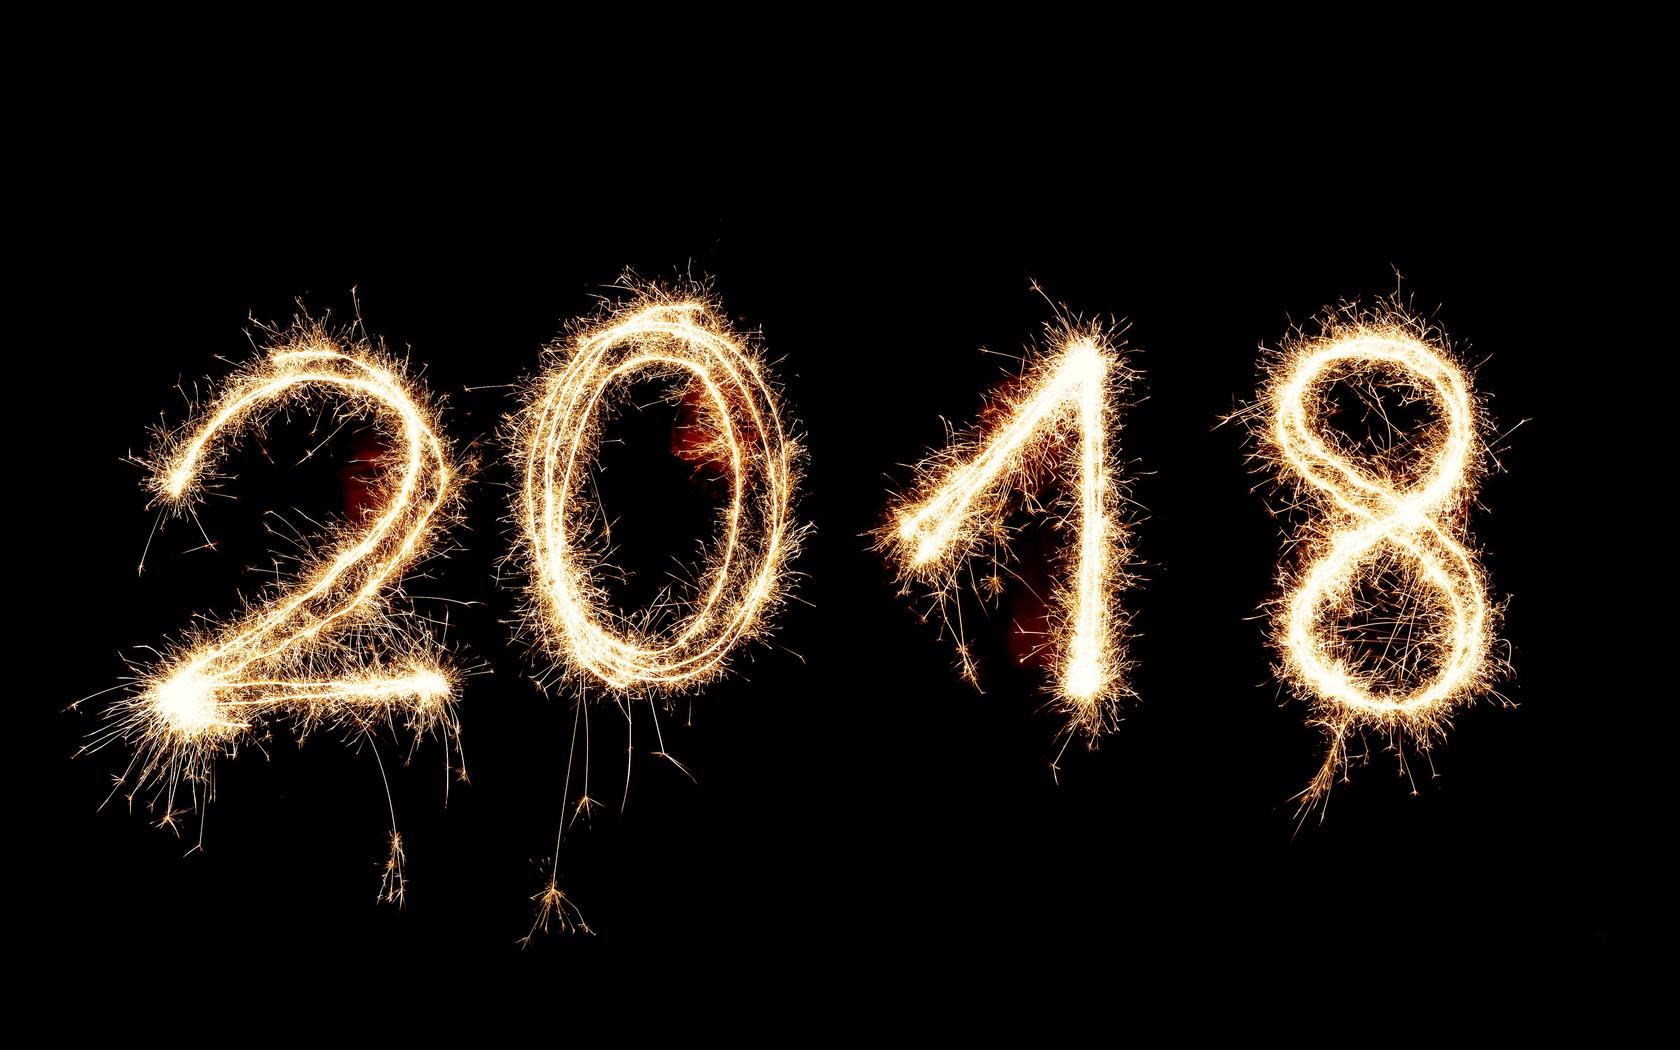 1680x1050 Happy New Year 2018 1680x1050 Resolution HD 4k